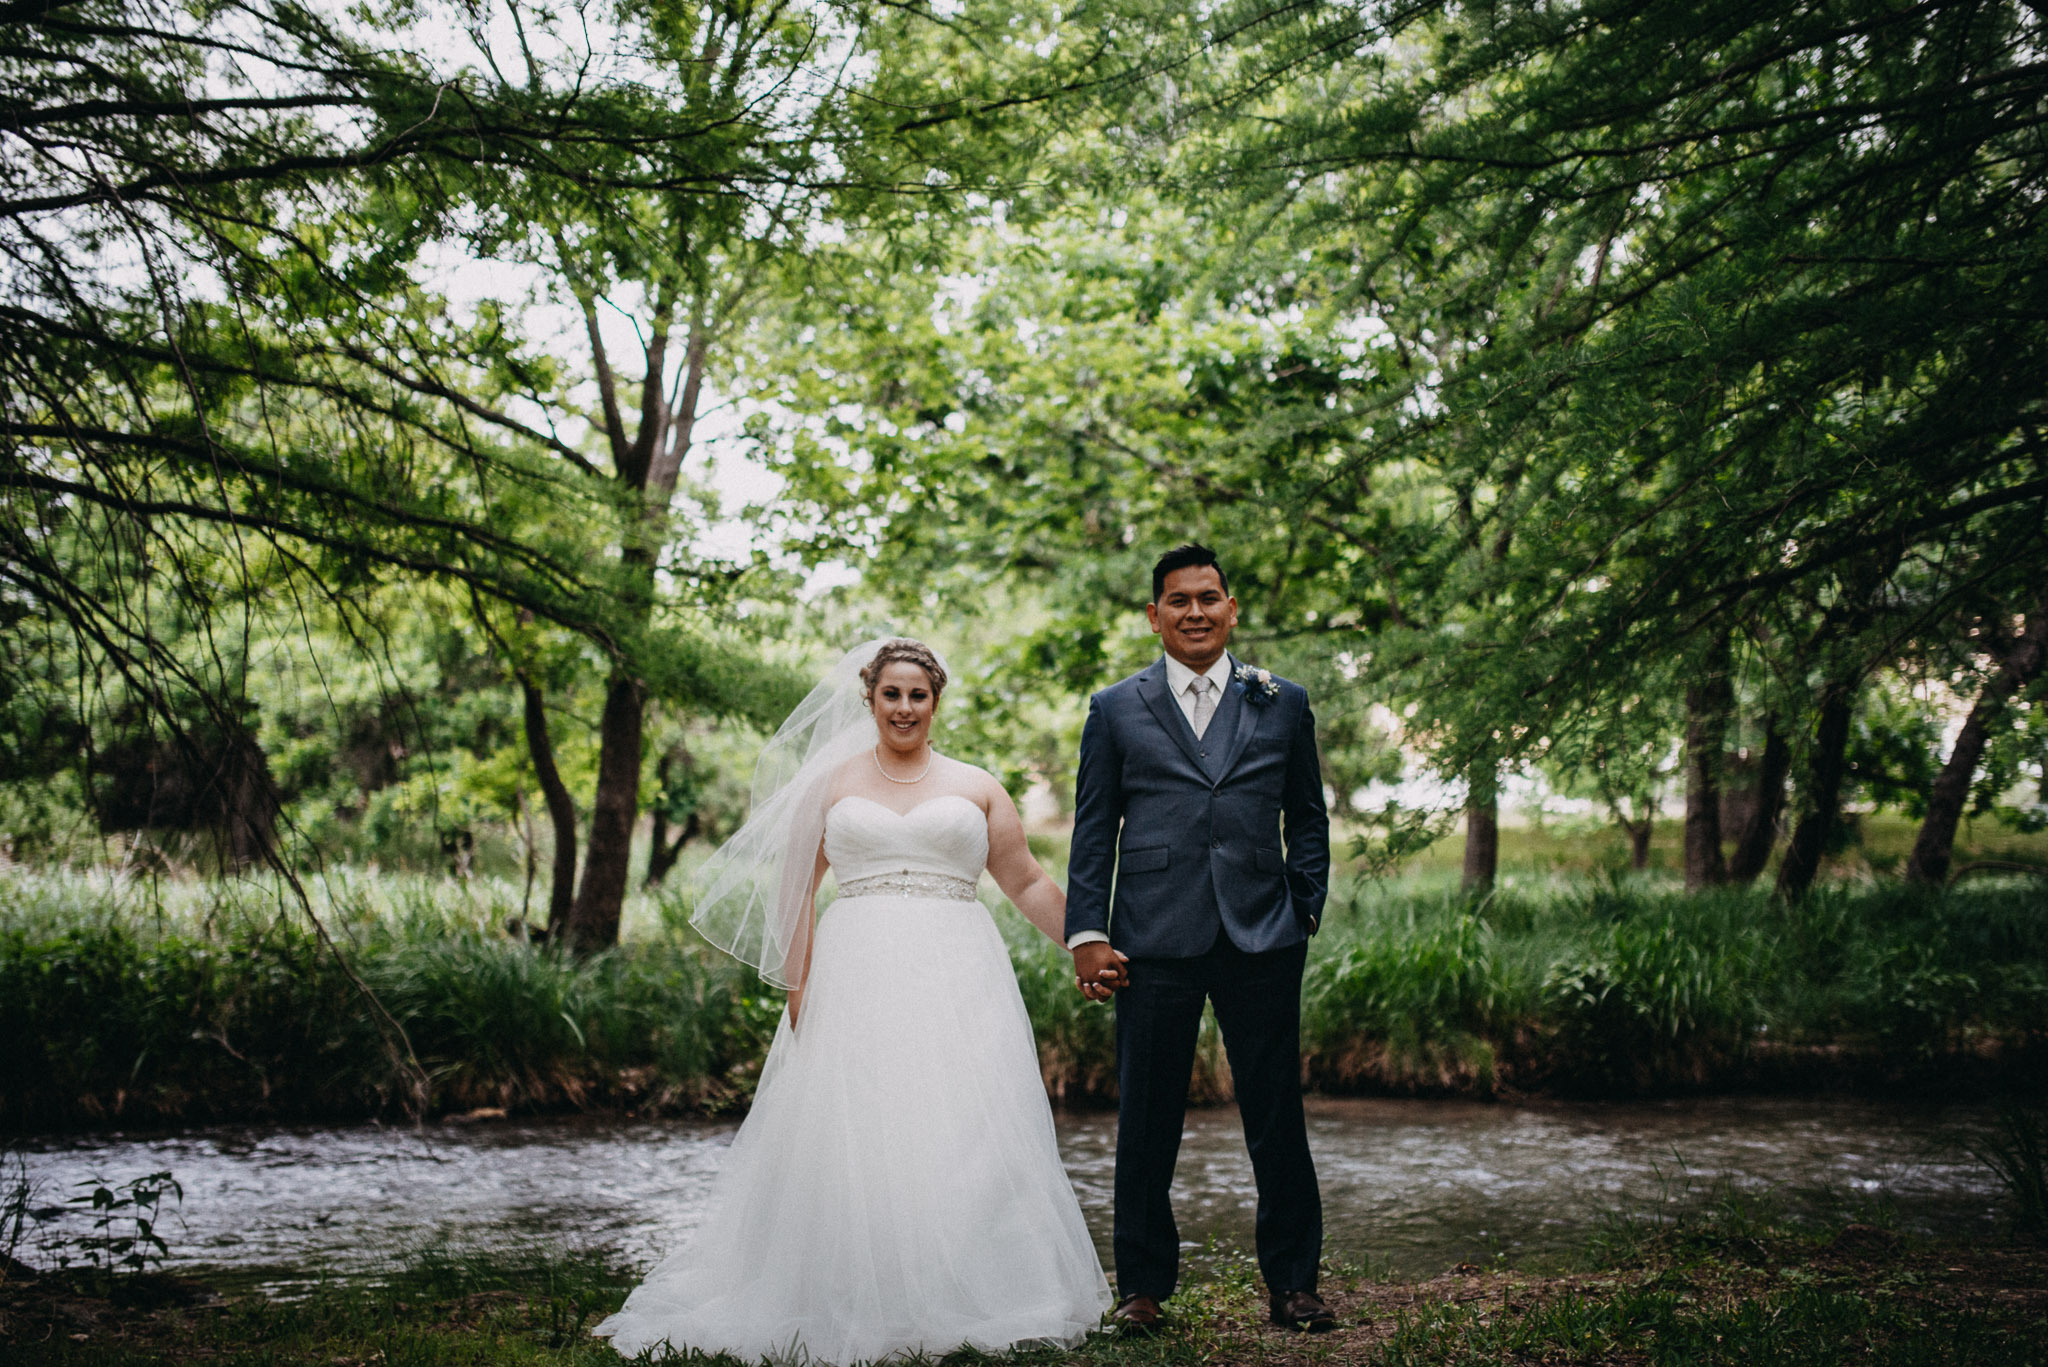 Christoval-Texas-Wedding_Photographer-Meghan&Tony-0025.jpg